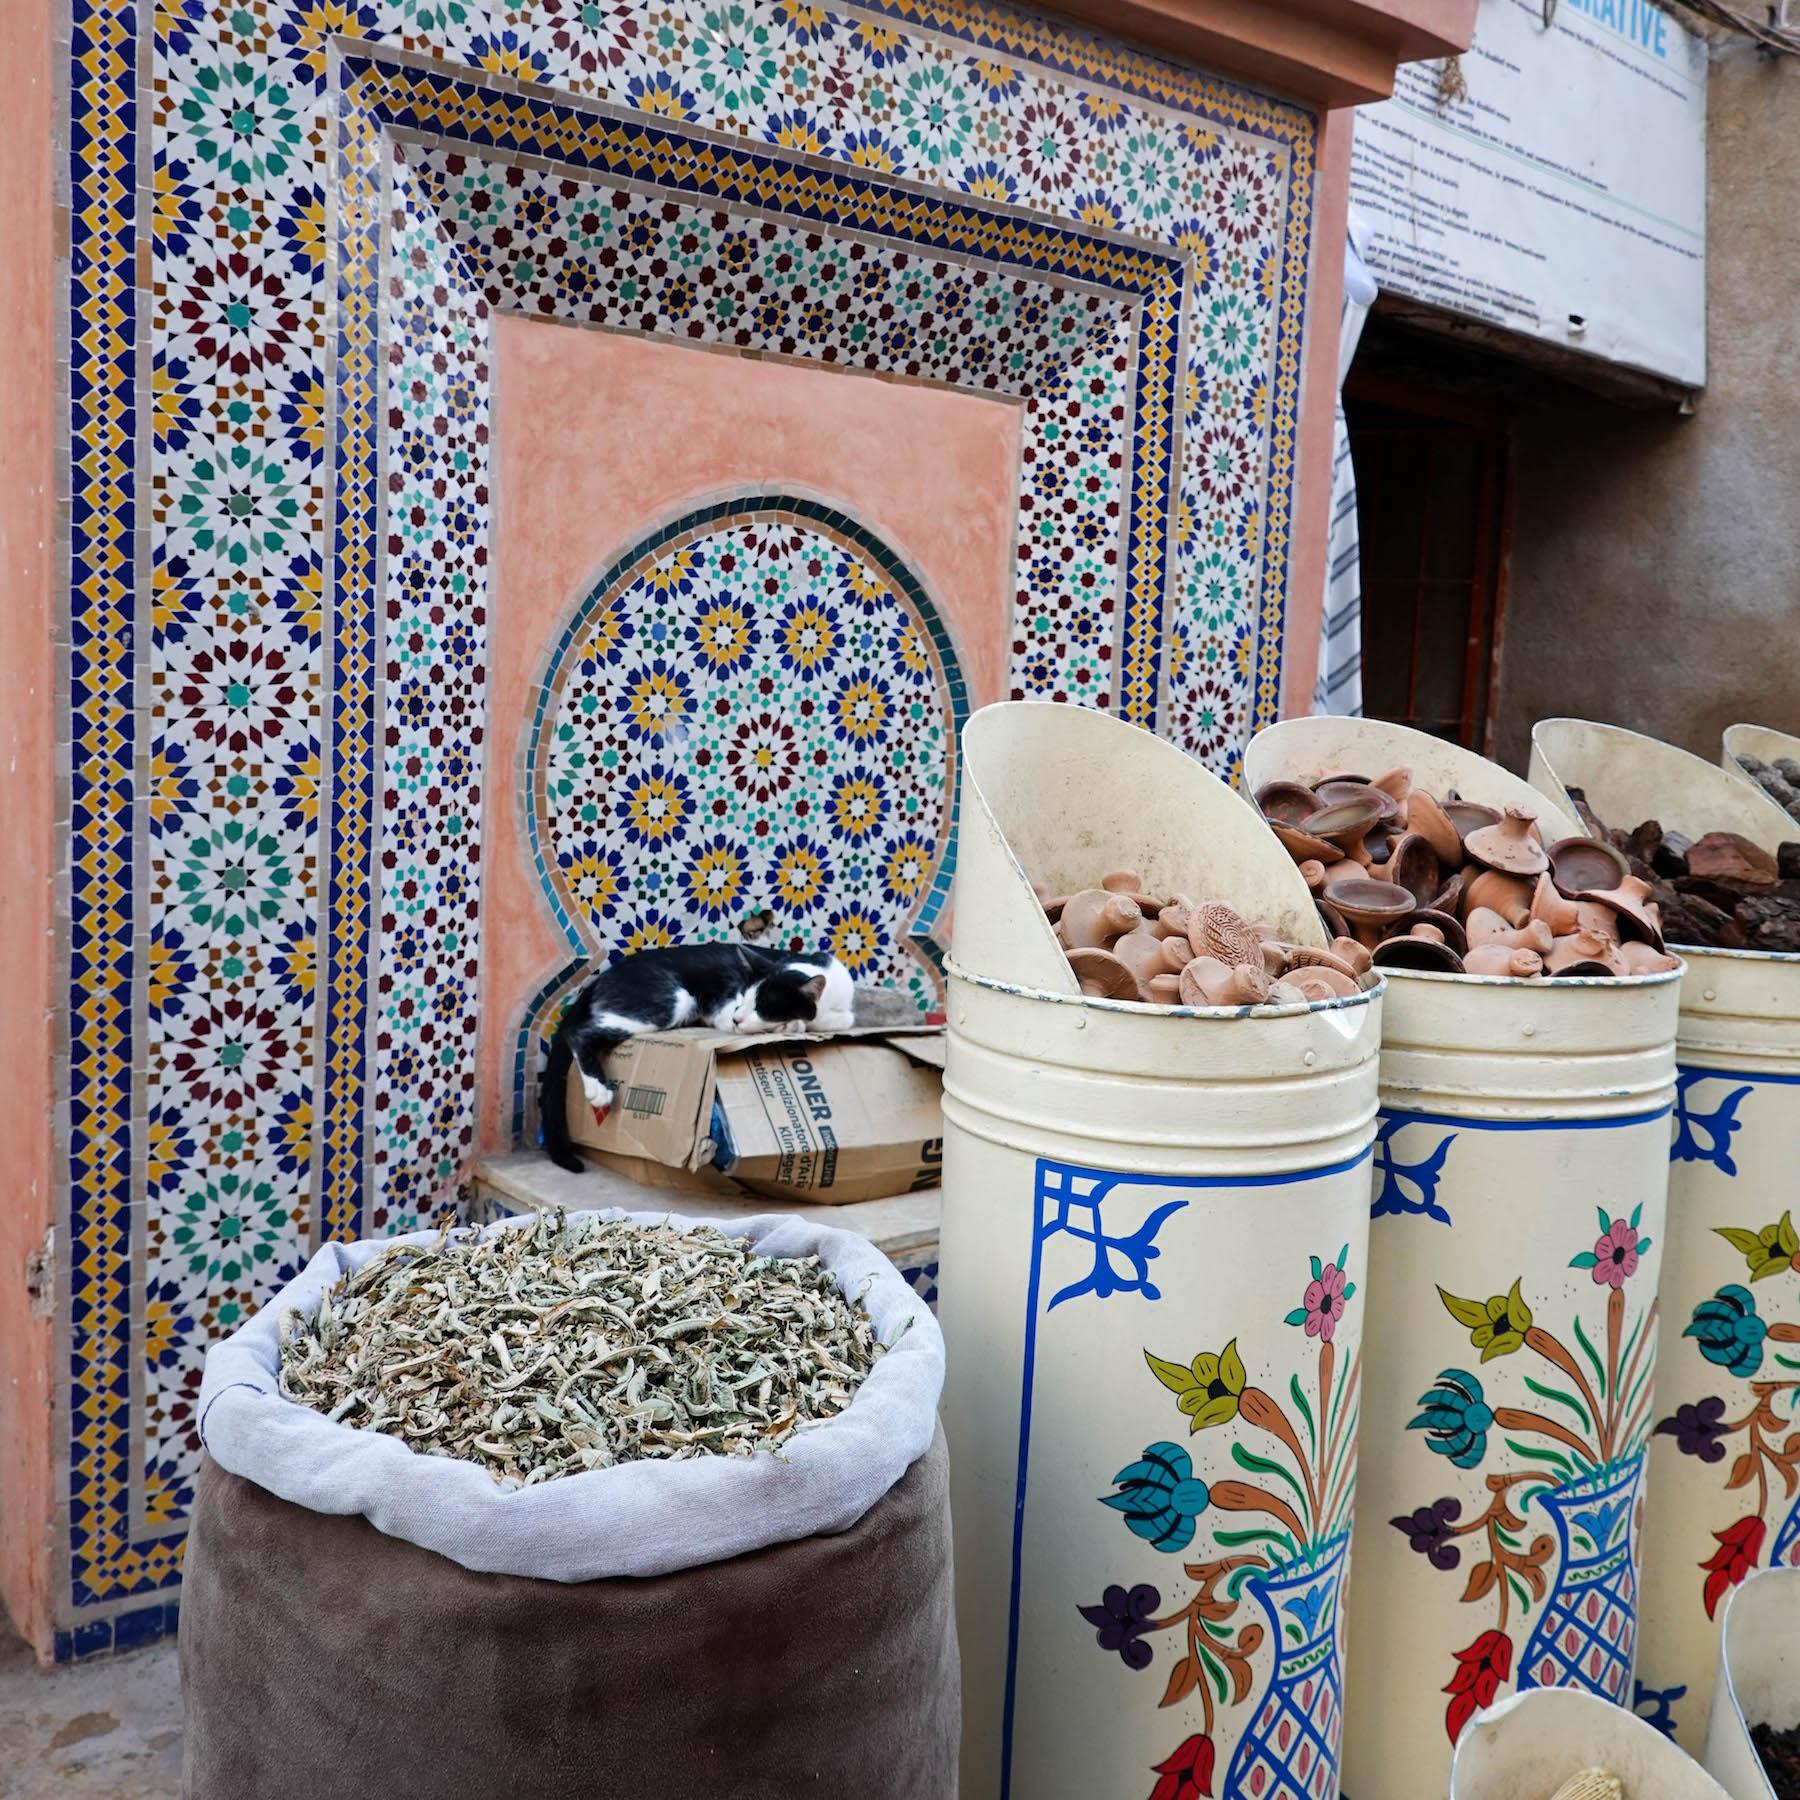 monat suelovesnyc_marrakesch_marrakech_souks_katze_weekly_update_monat_blog marrakesch